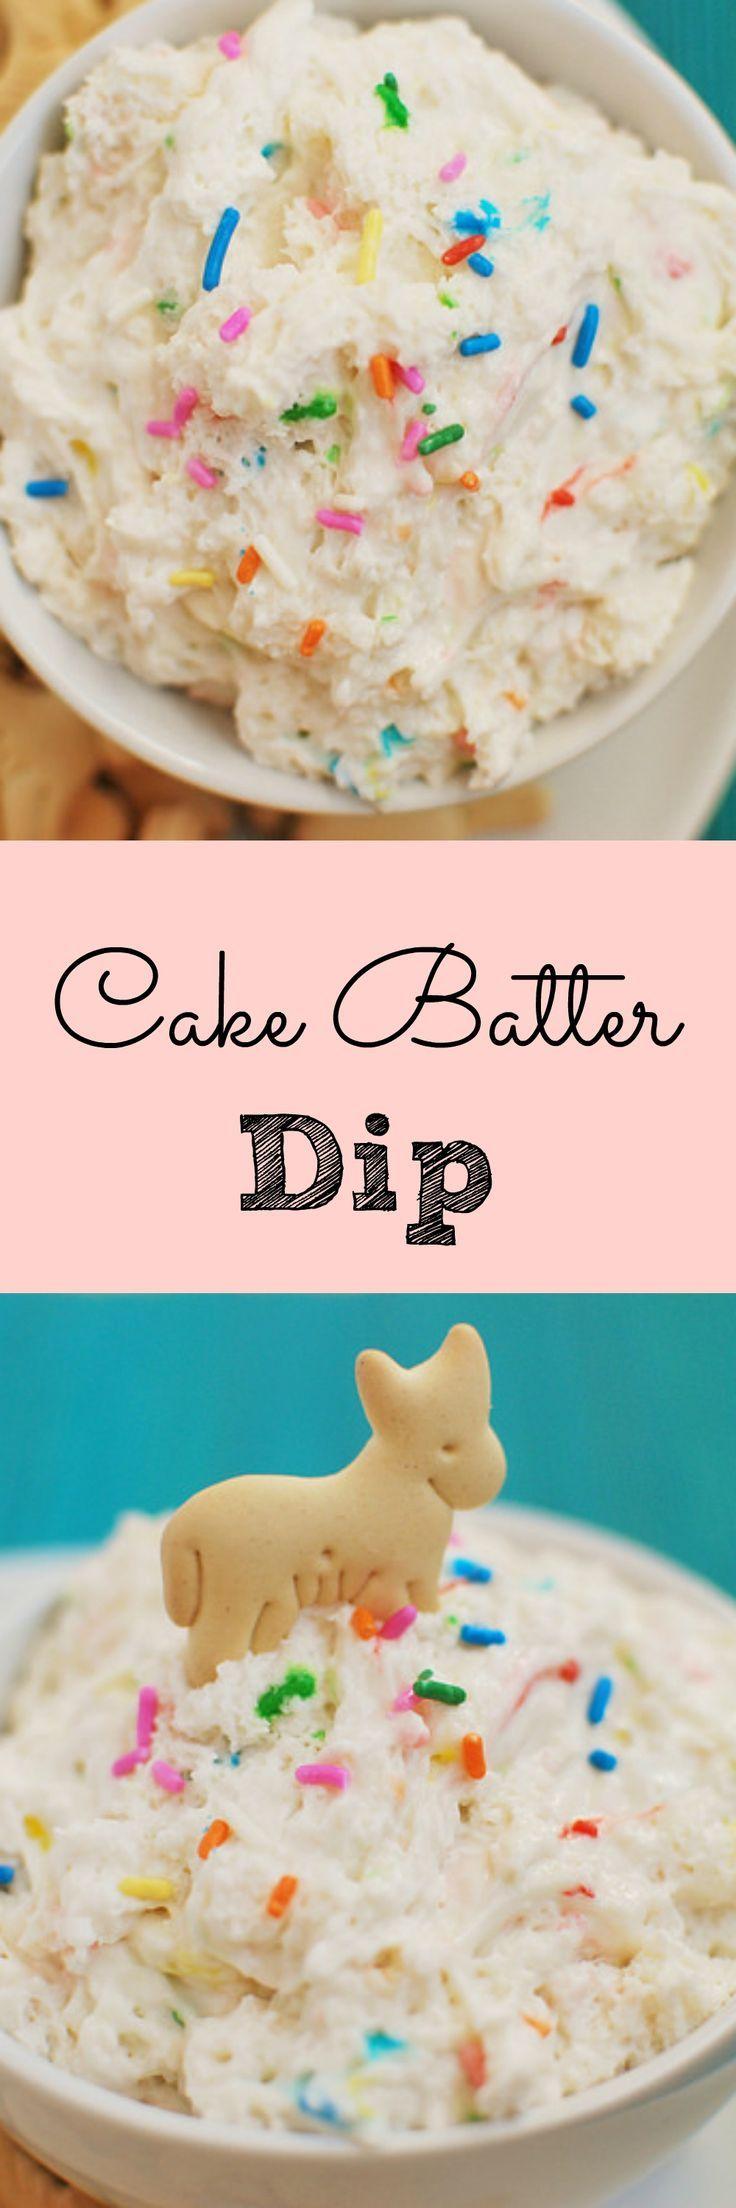 Cake Batter Dip - your new favorite dessert dip!